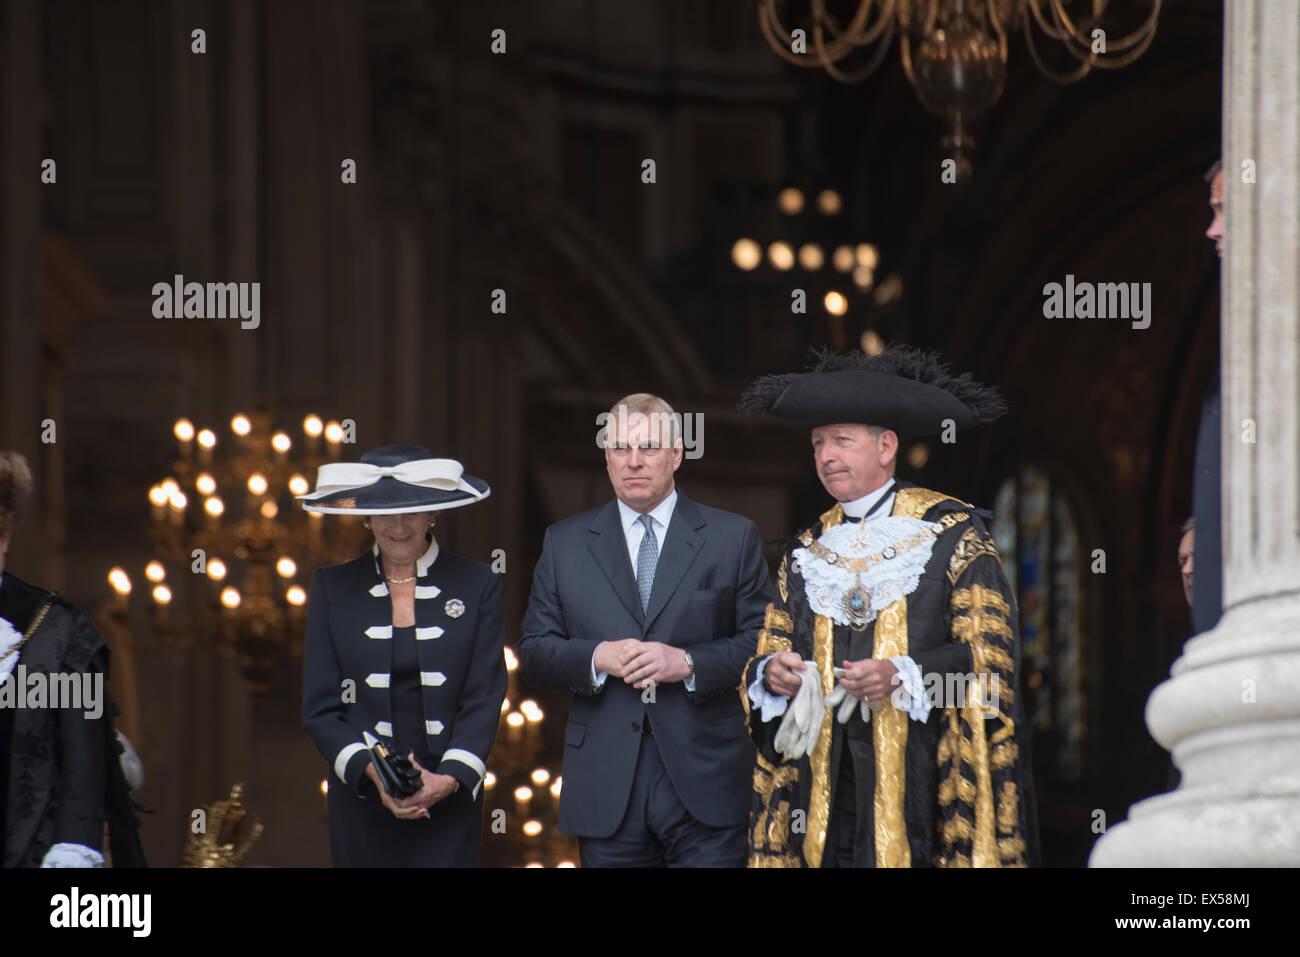 London, UK. 7th July, 2015. 10th Anniversary of London Bombings, Prince Andrew the Duke of York leaves St Paul's - Stock Image